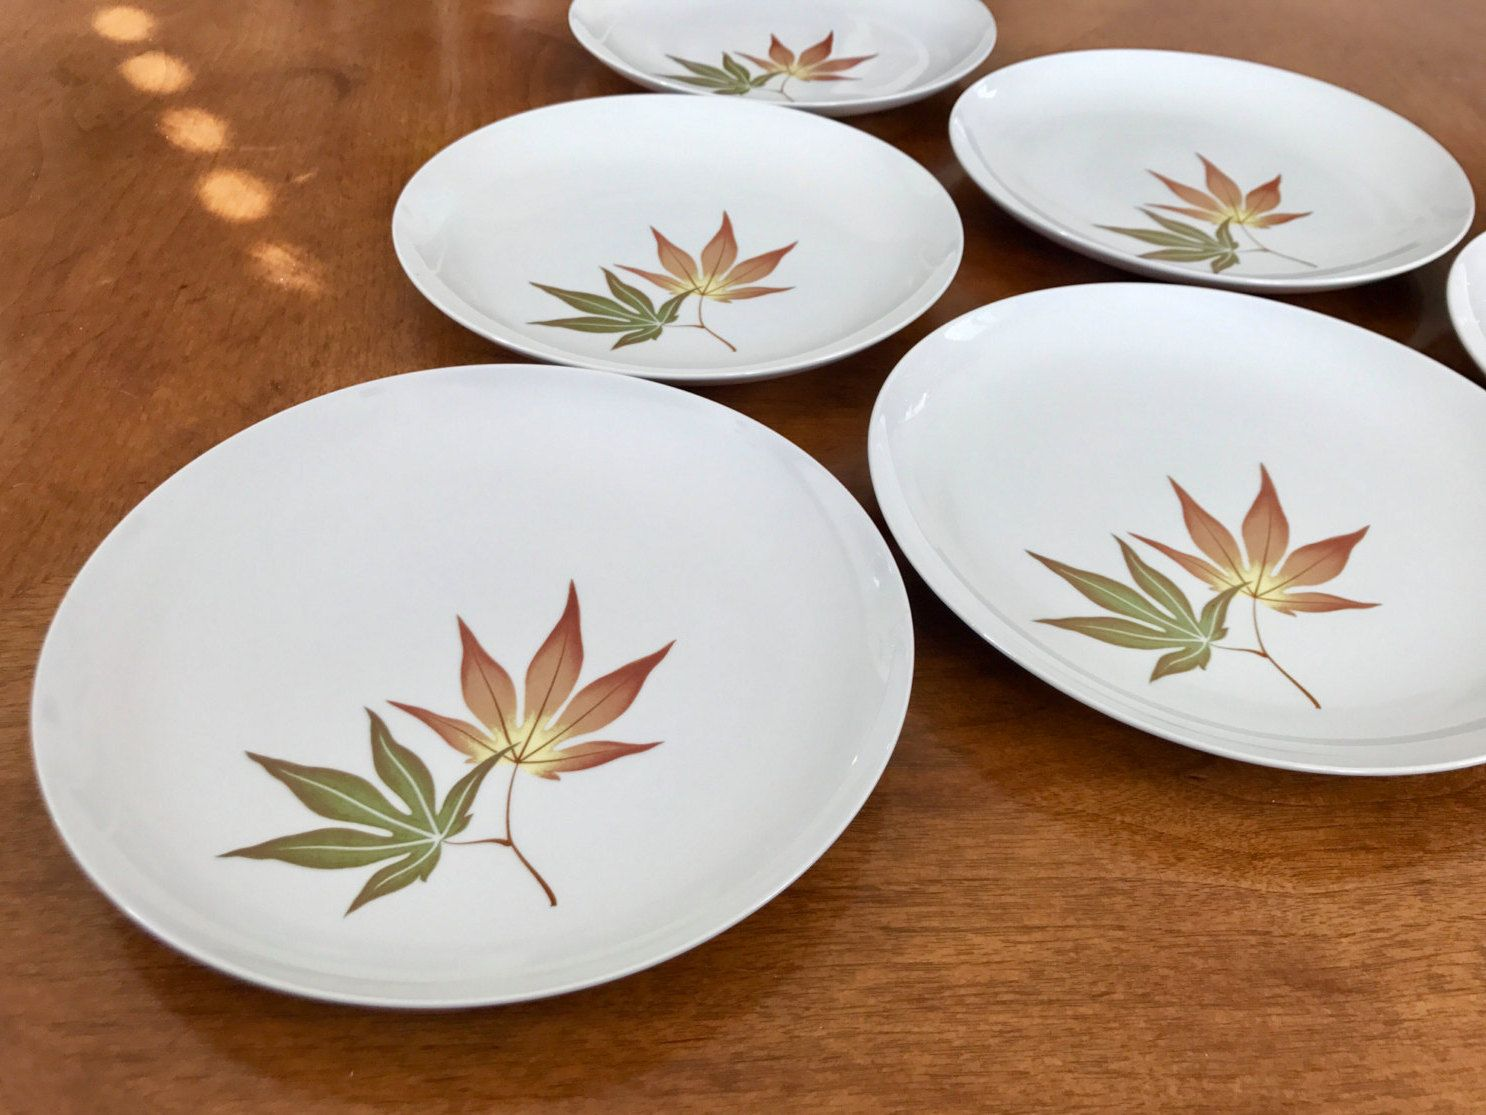 vintage franciscan dinner plates twice nice franciscan china  -  vintage franciscan dinner plates twice nice franciscan chinawhitestone ware mid century modern plates leaf pattern brown green